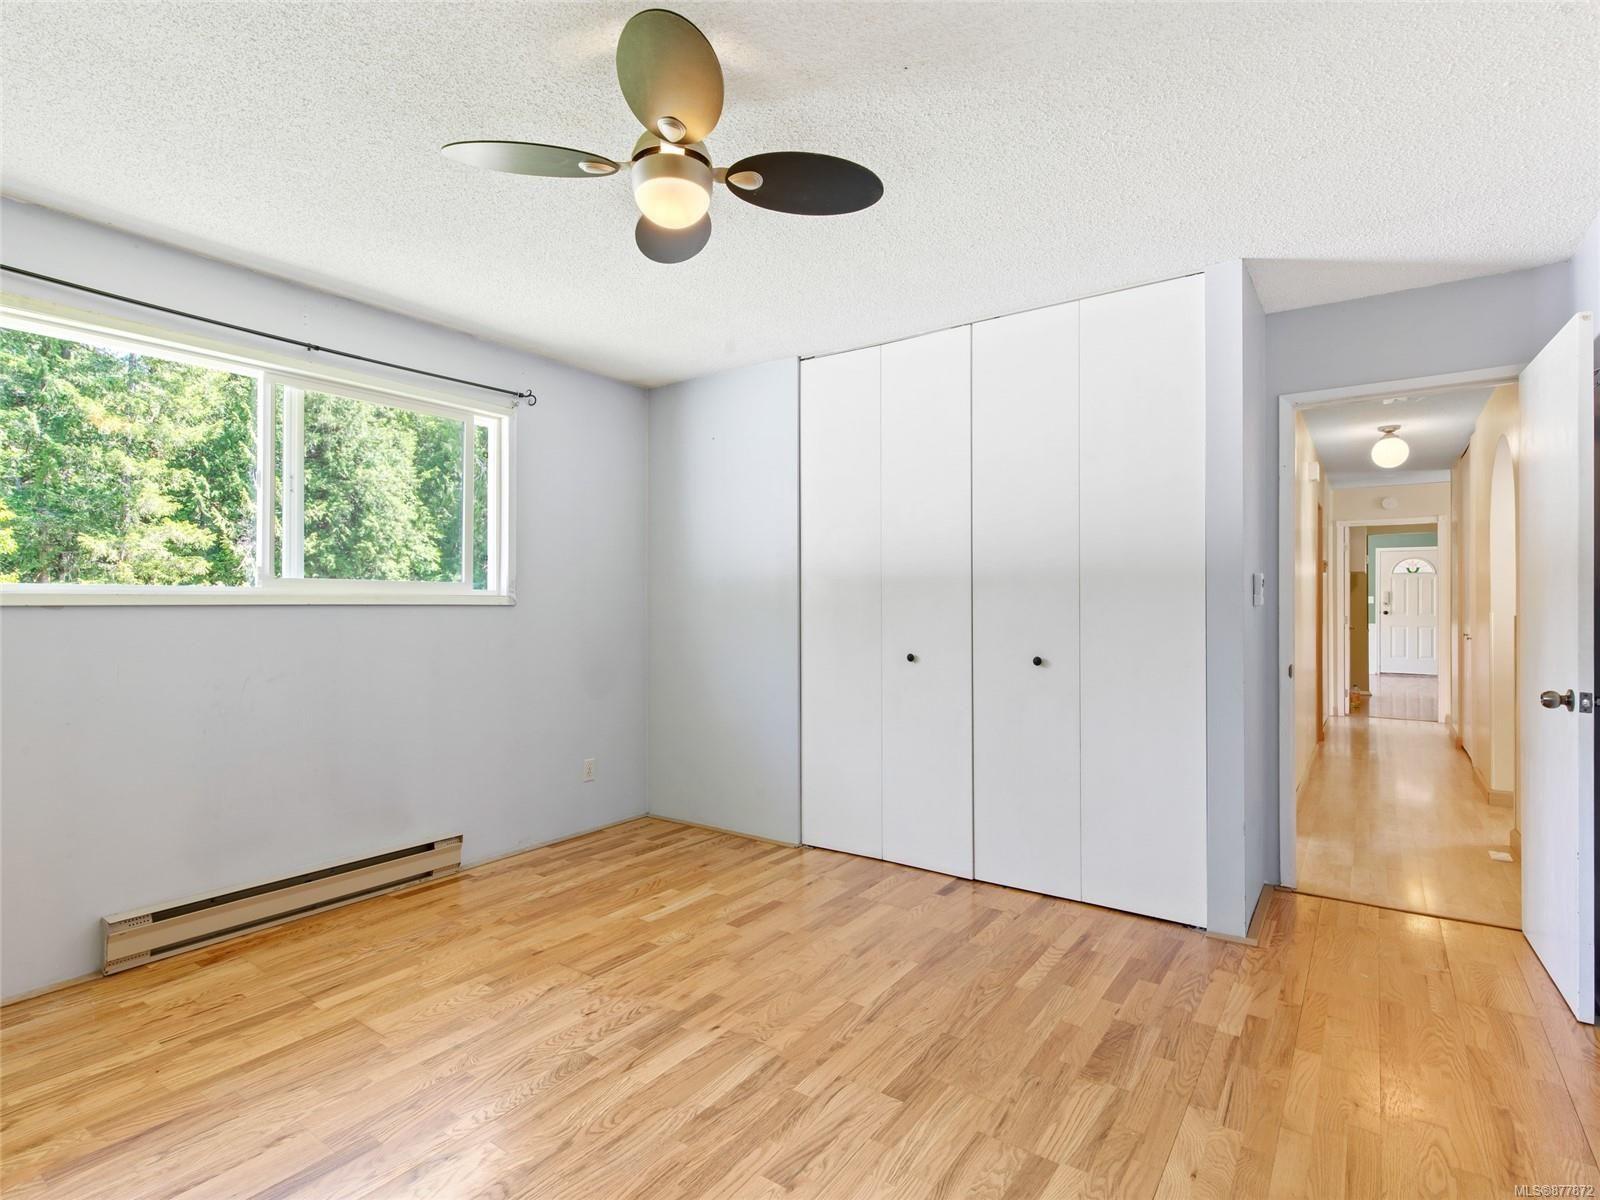 Photo 16: Photos: 7865 Wardrop Rd in : PA Port Alberni House for sale (Port Alberni)  : MLS®# 877872